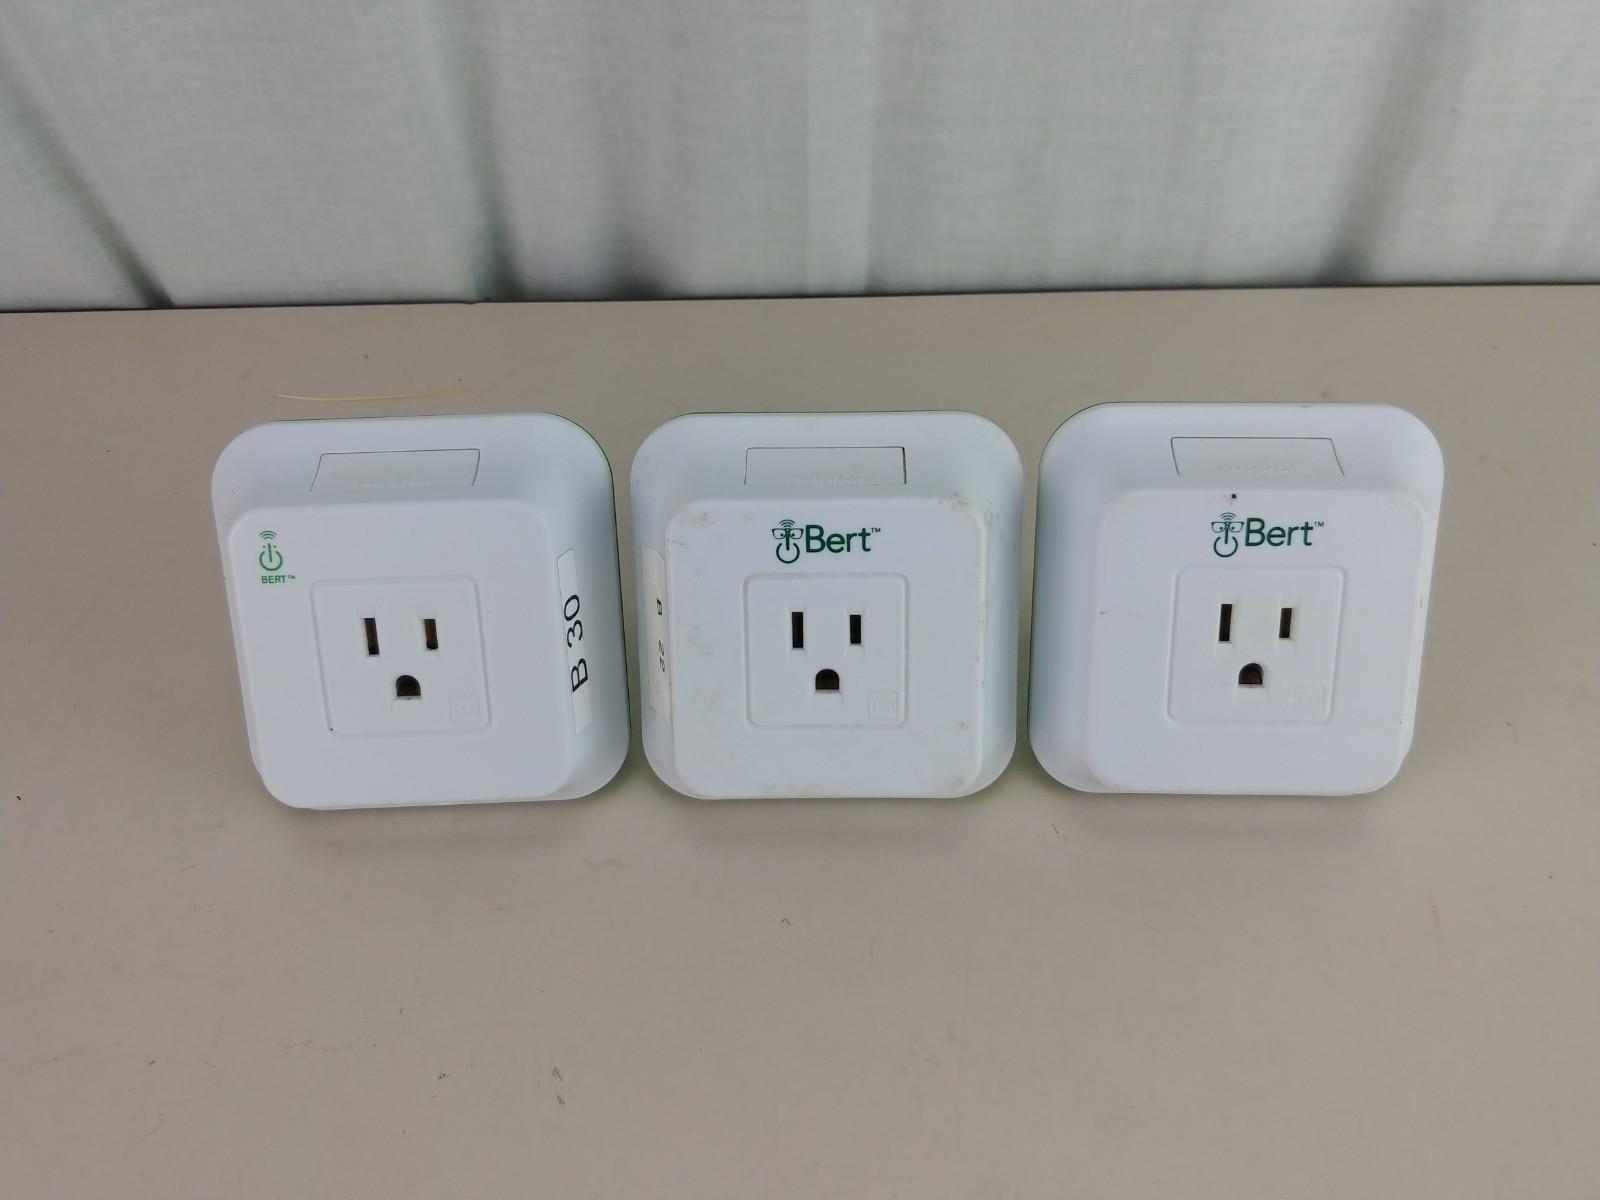 Bert 110 WLAN Smart Plug Lot of 3